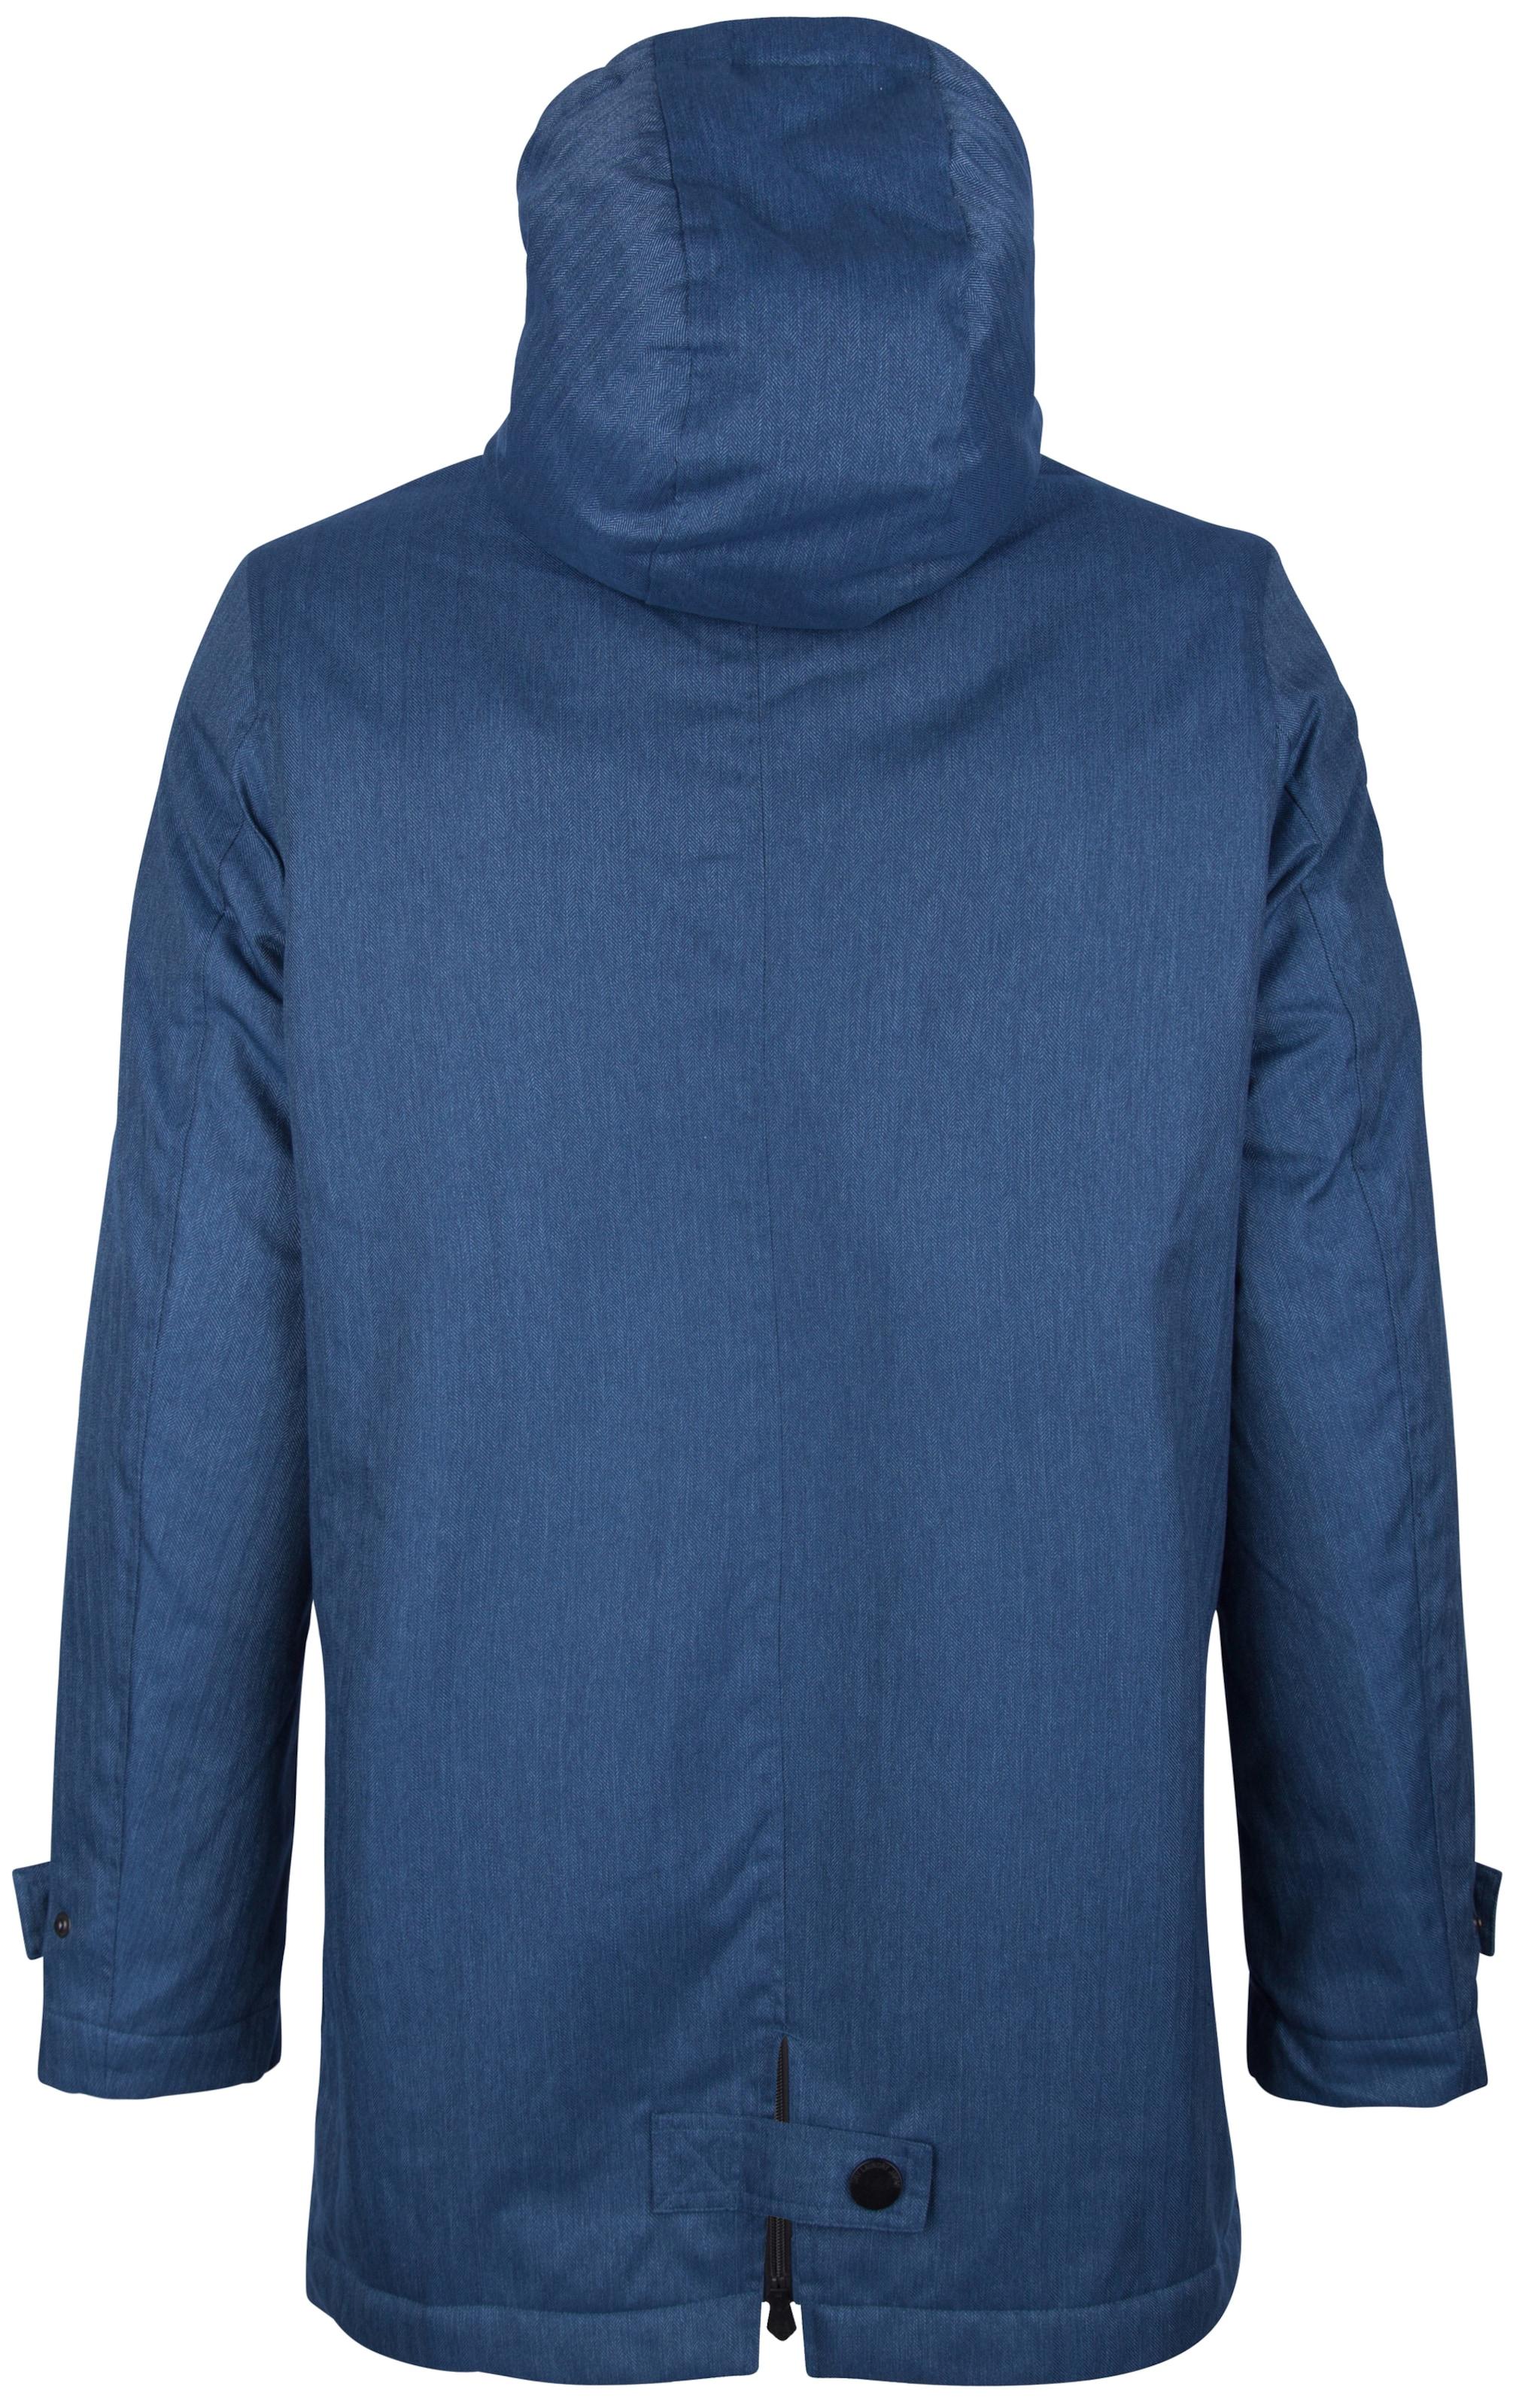 Dry In Blau Anorak Laundry Laundry Dry EH29WDI